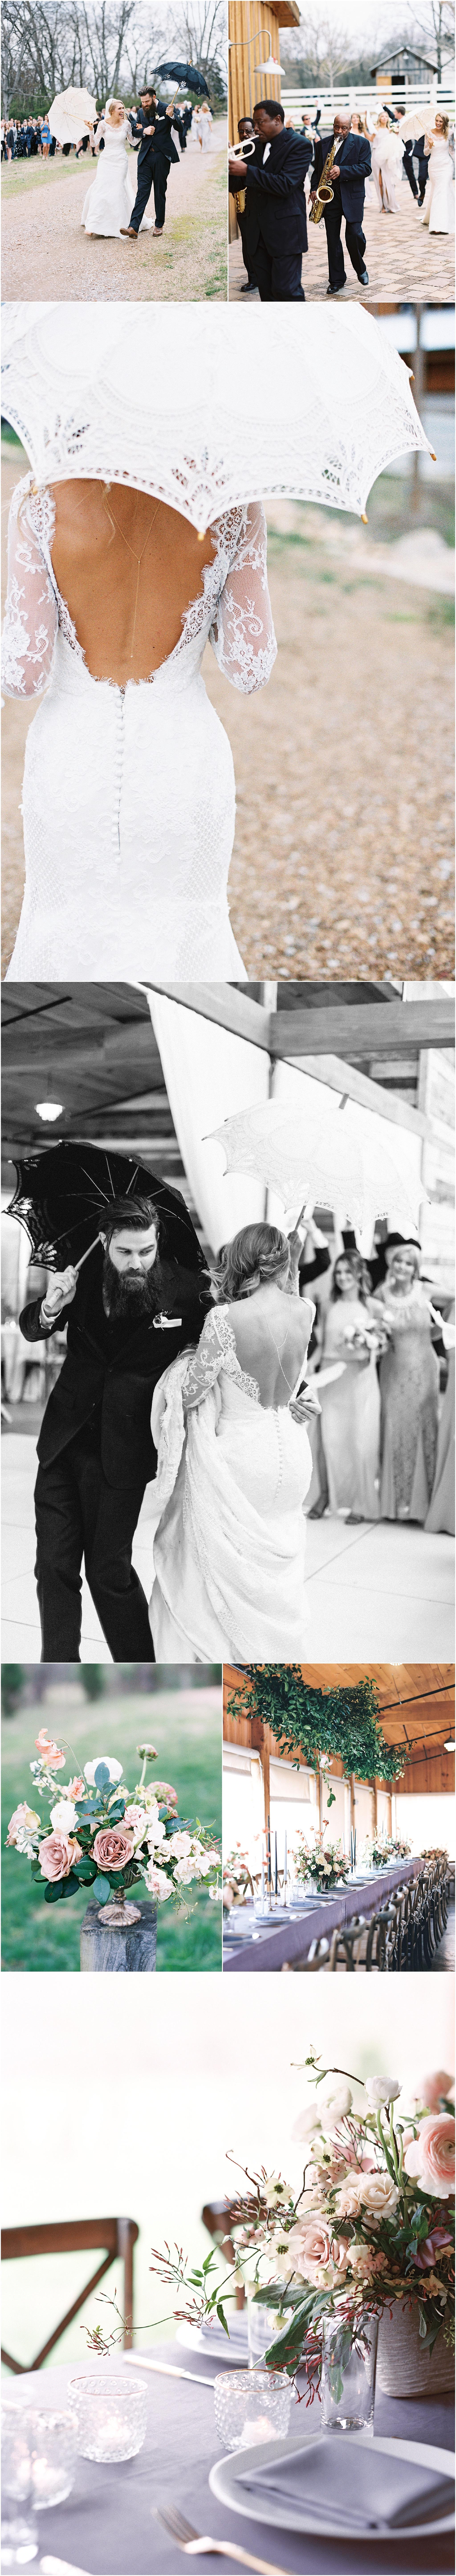 Atlanta wedding photographer film Sarah Ingram